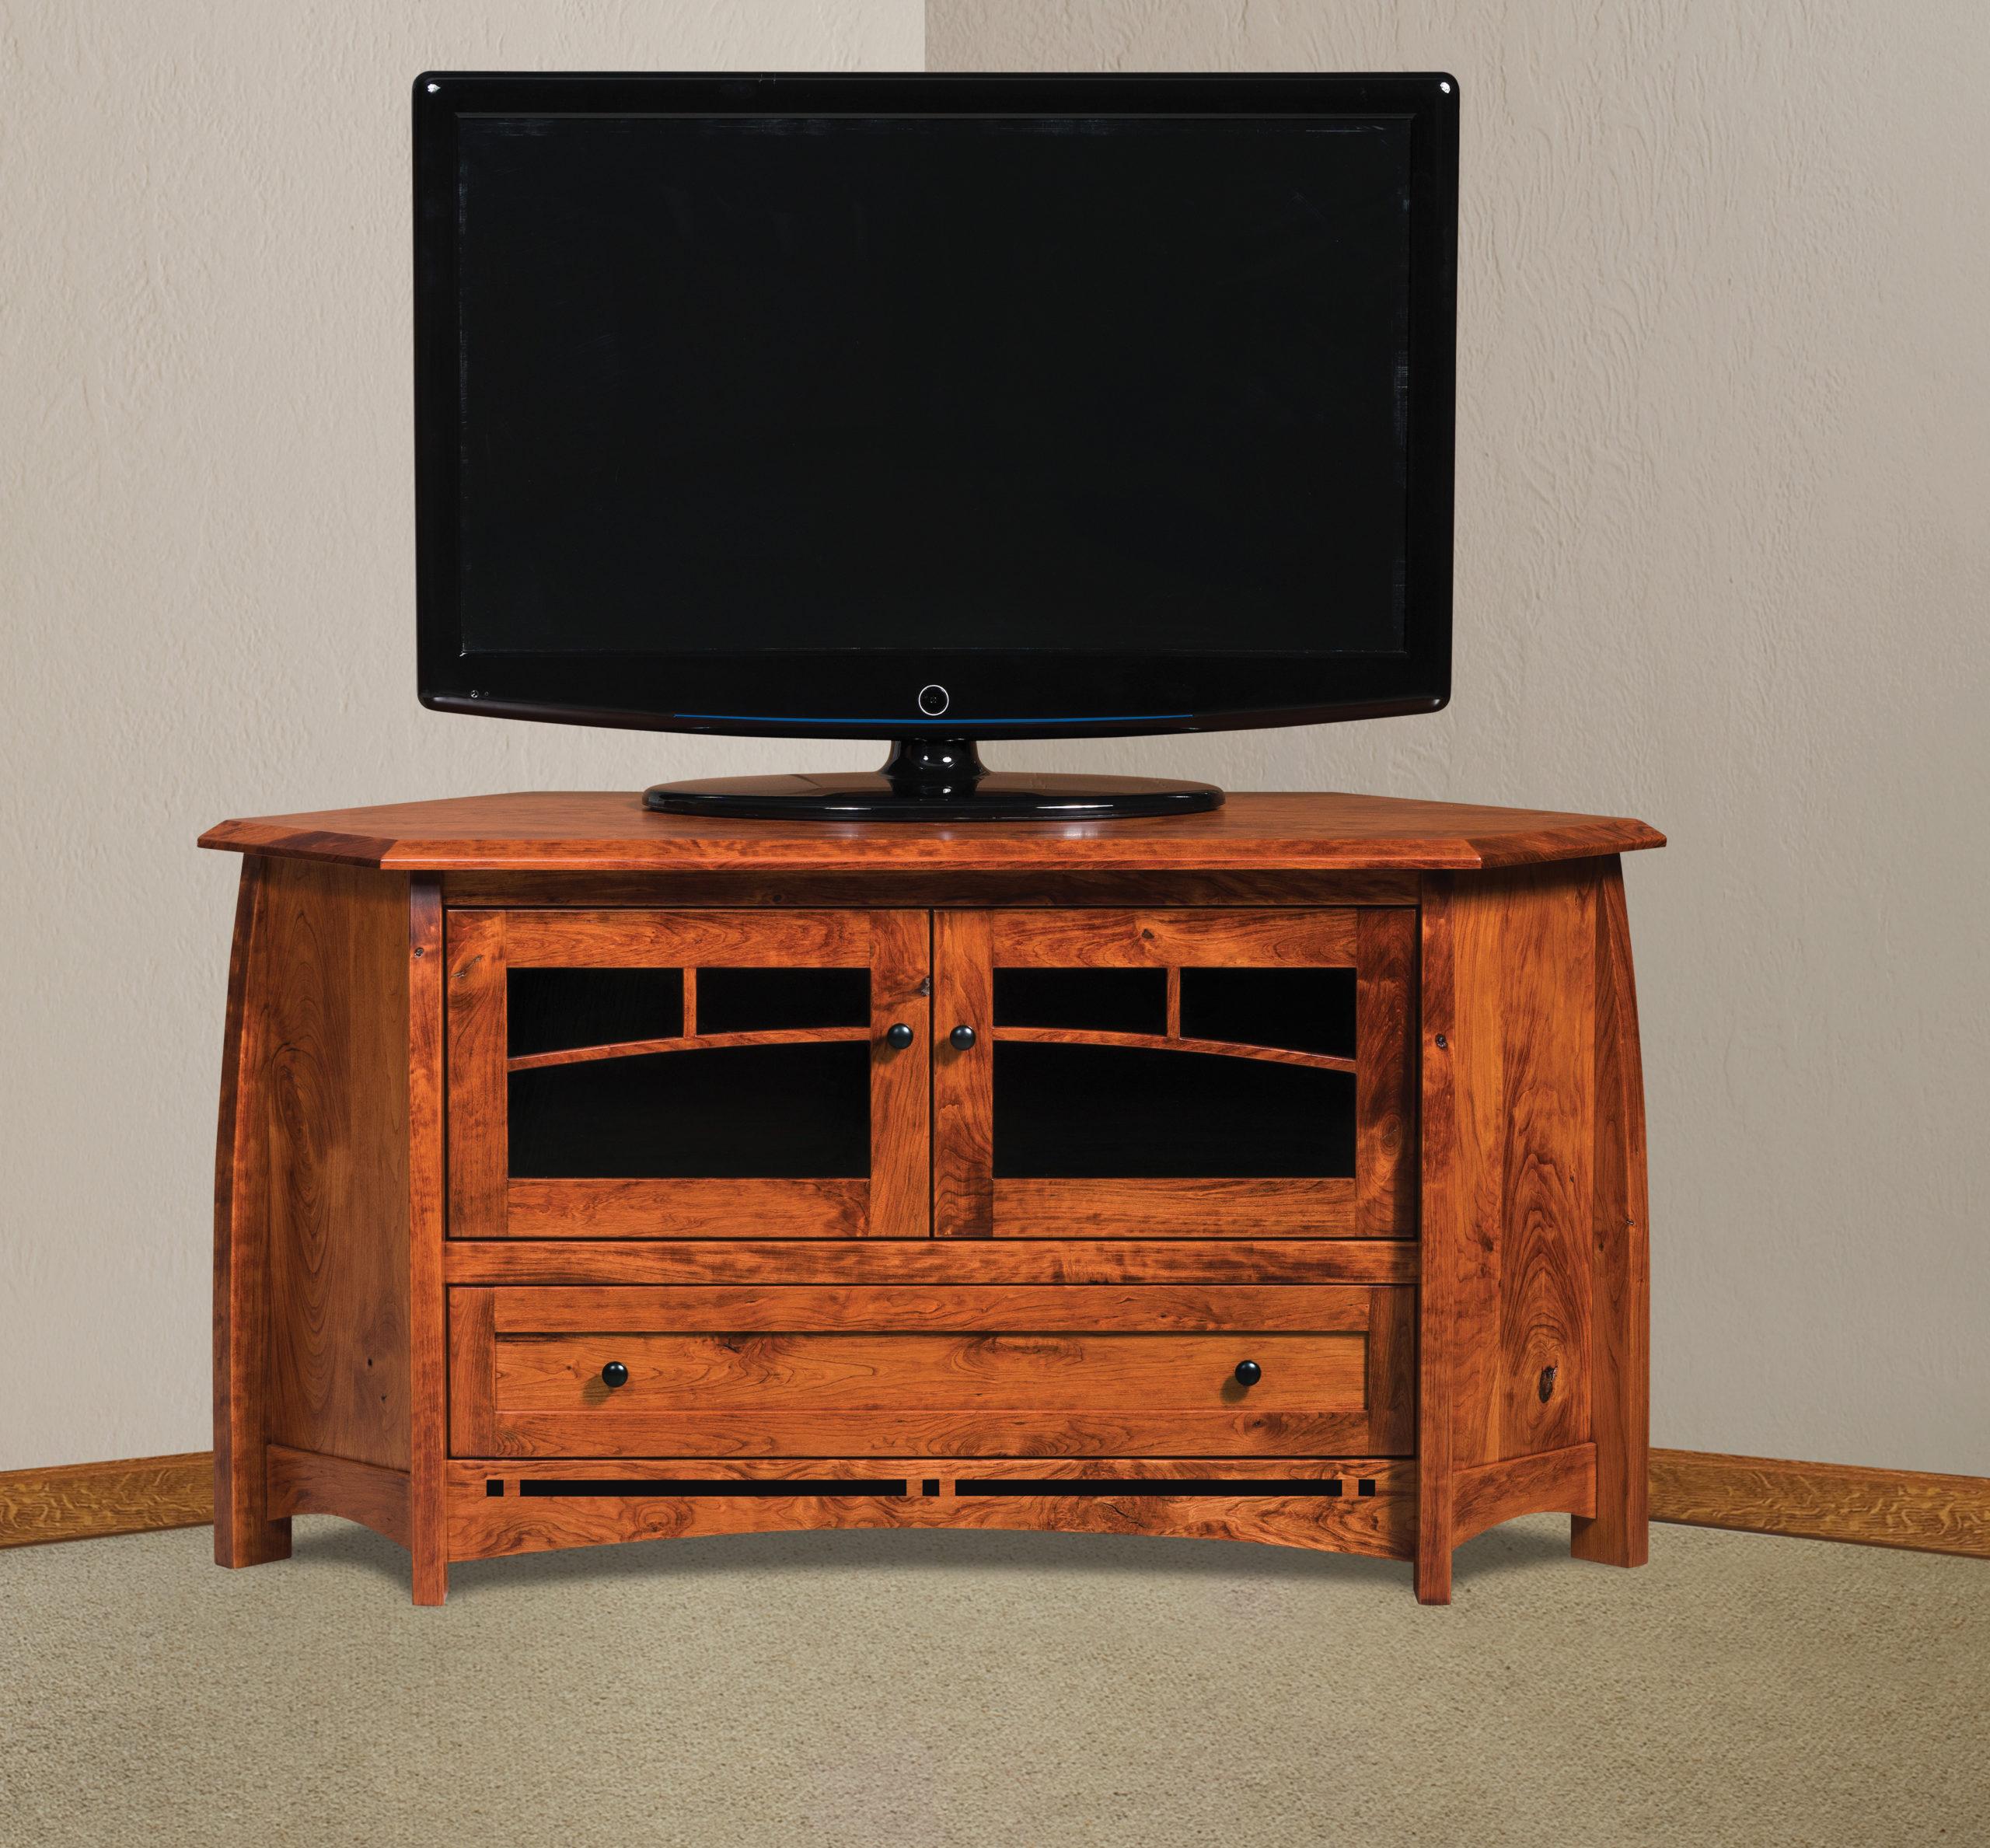 Priya Corner Tv Stands With Latest Boulder Creek Corner Tv Stand (View 1 of 25)